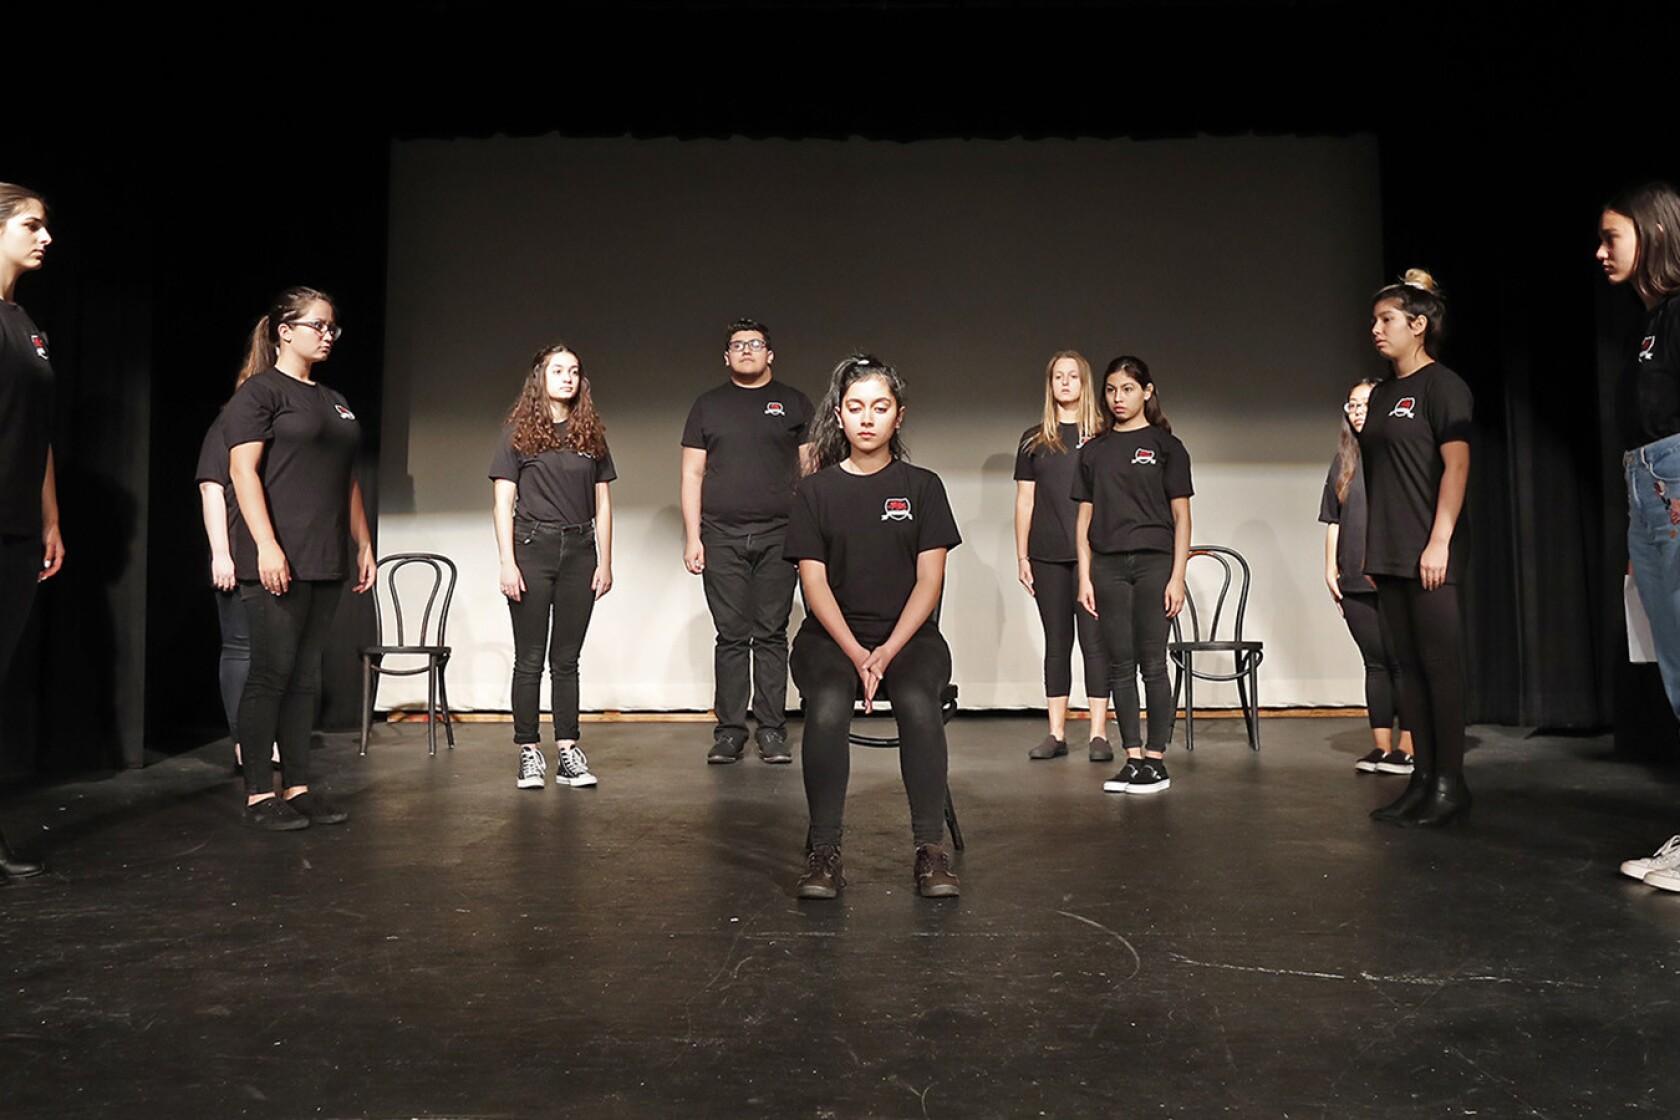 Estancia High School drama class pens an original play about